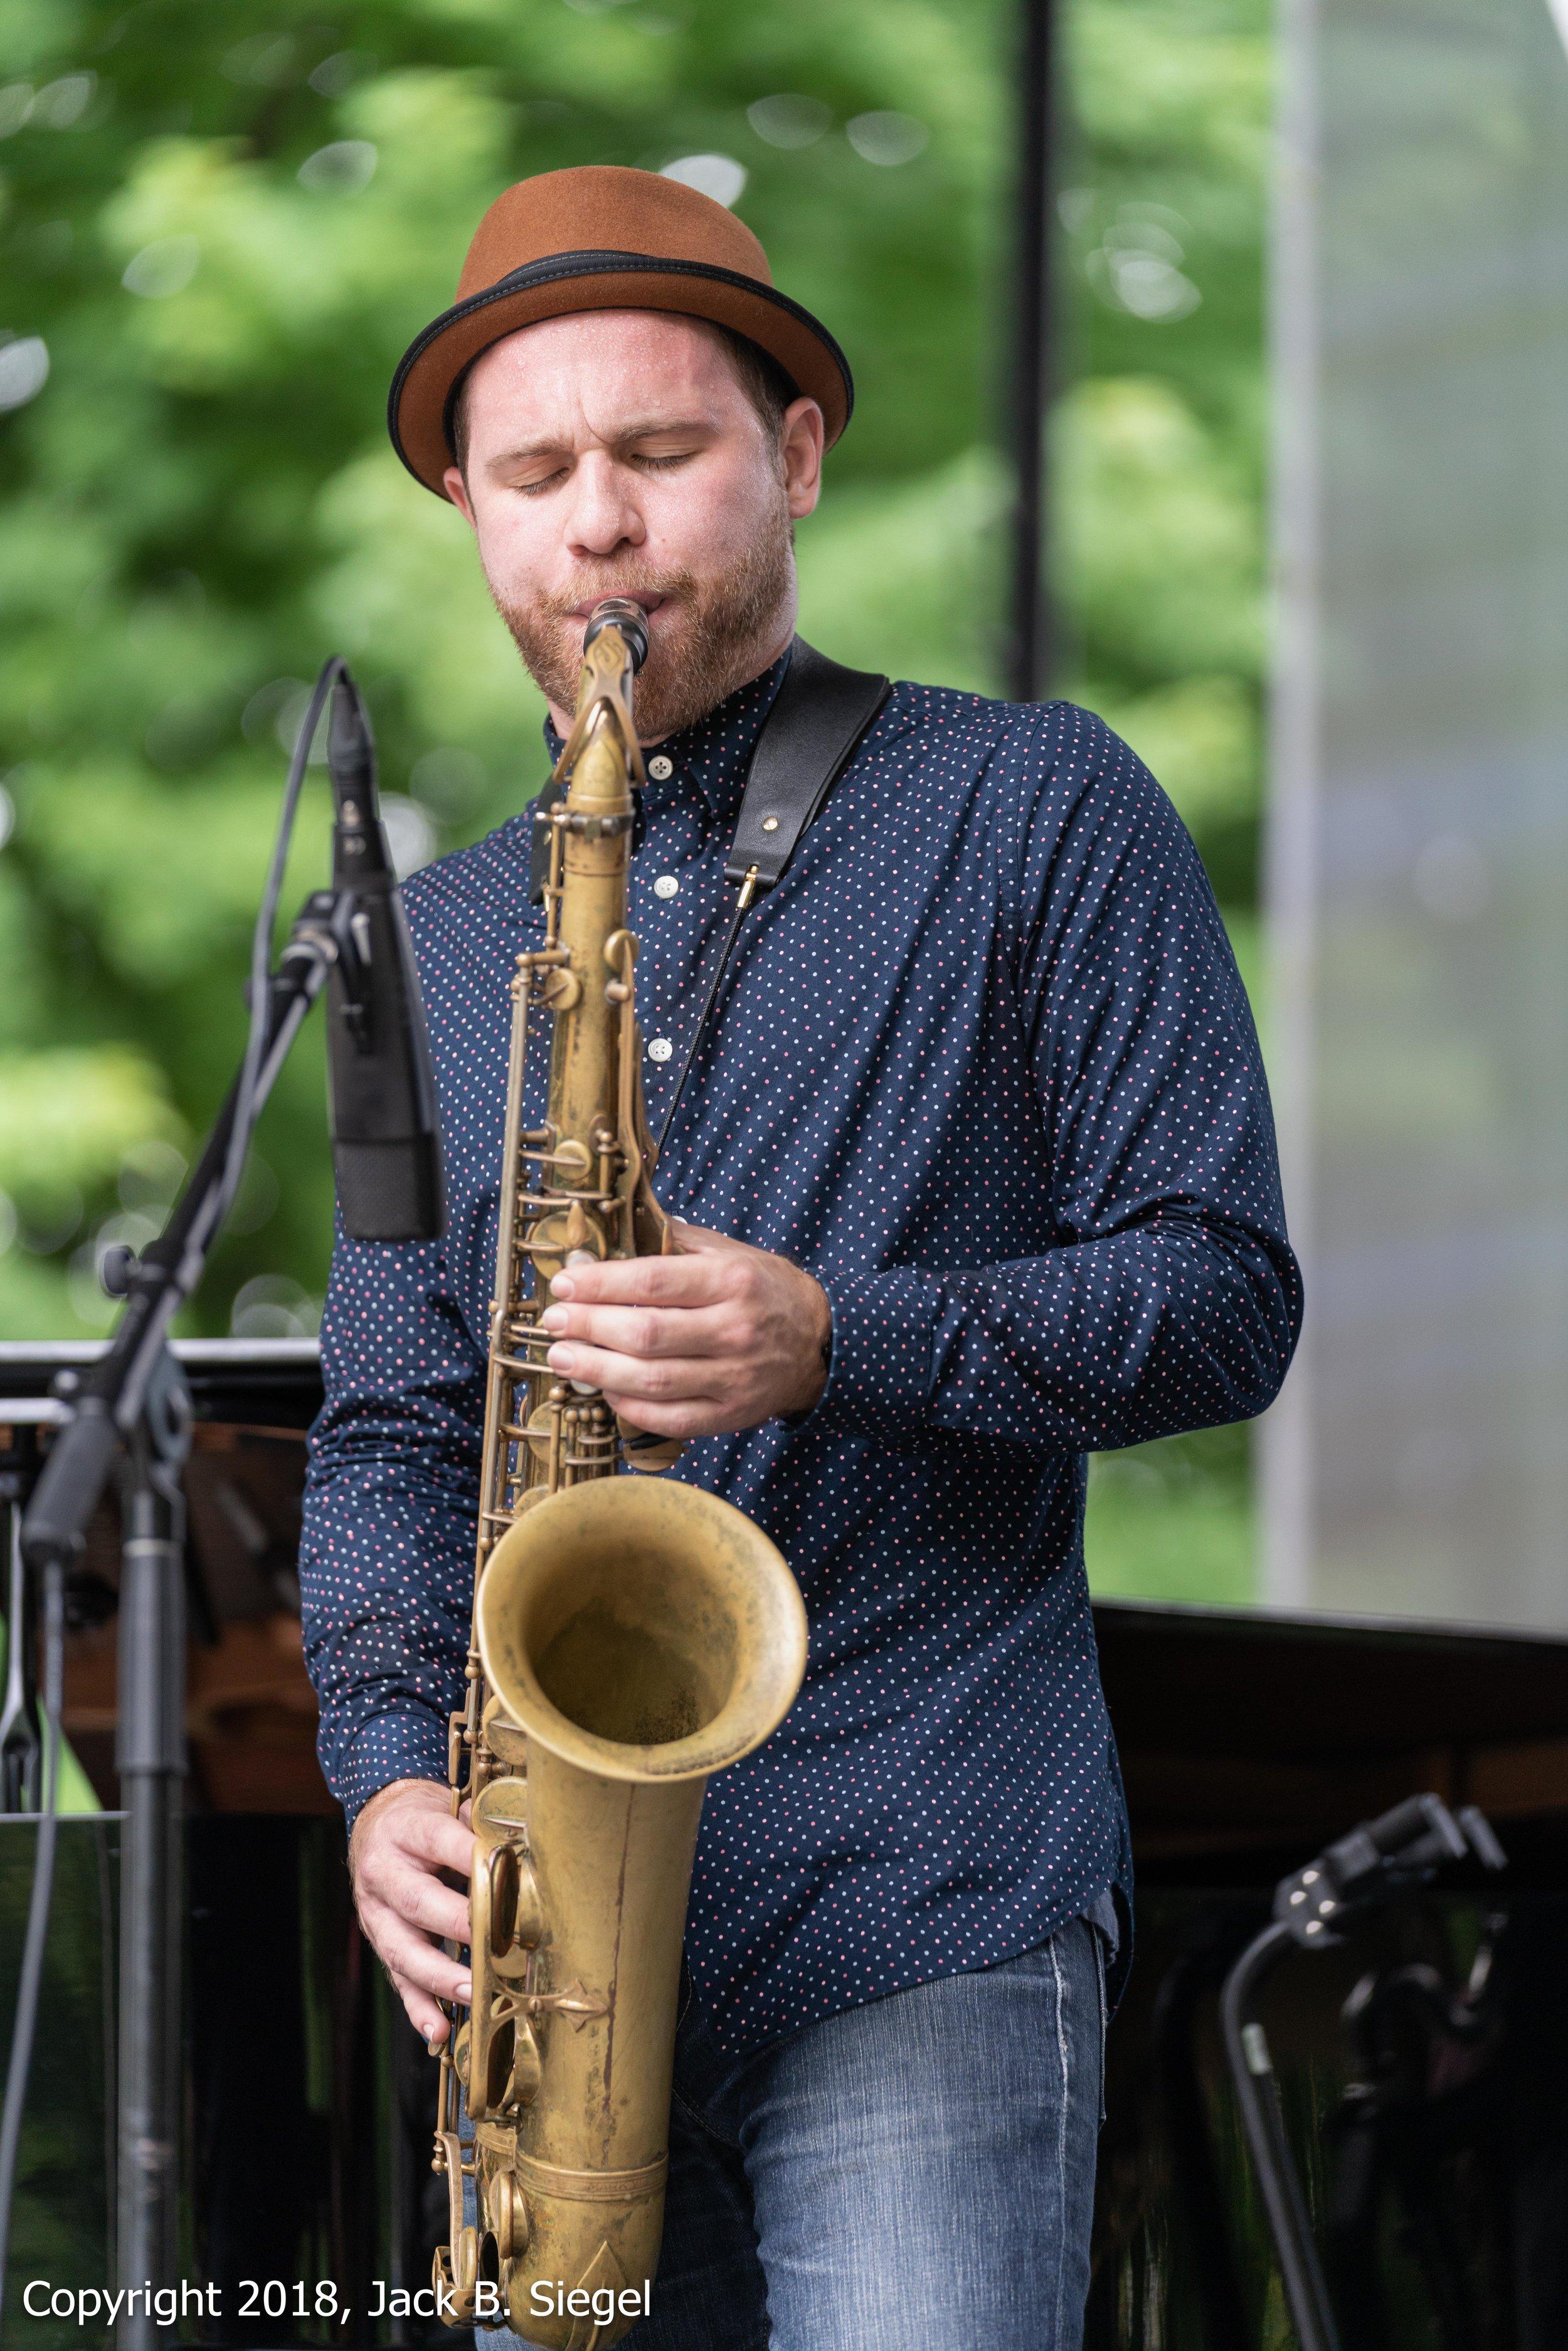 _DS16084_Copyright 2018 jpeg_Unidentified Sax Player with Dustin Laurenzi's Natural Language.jpg